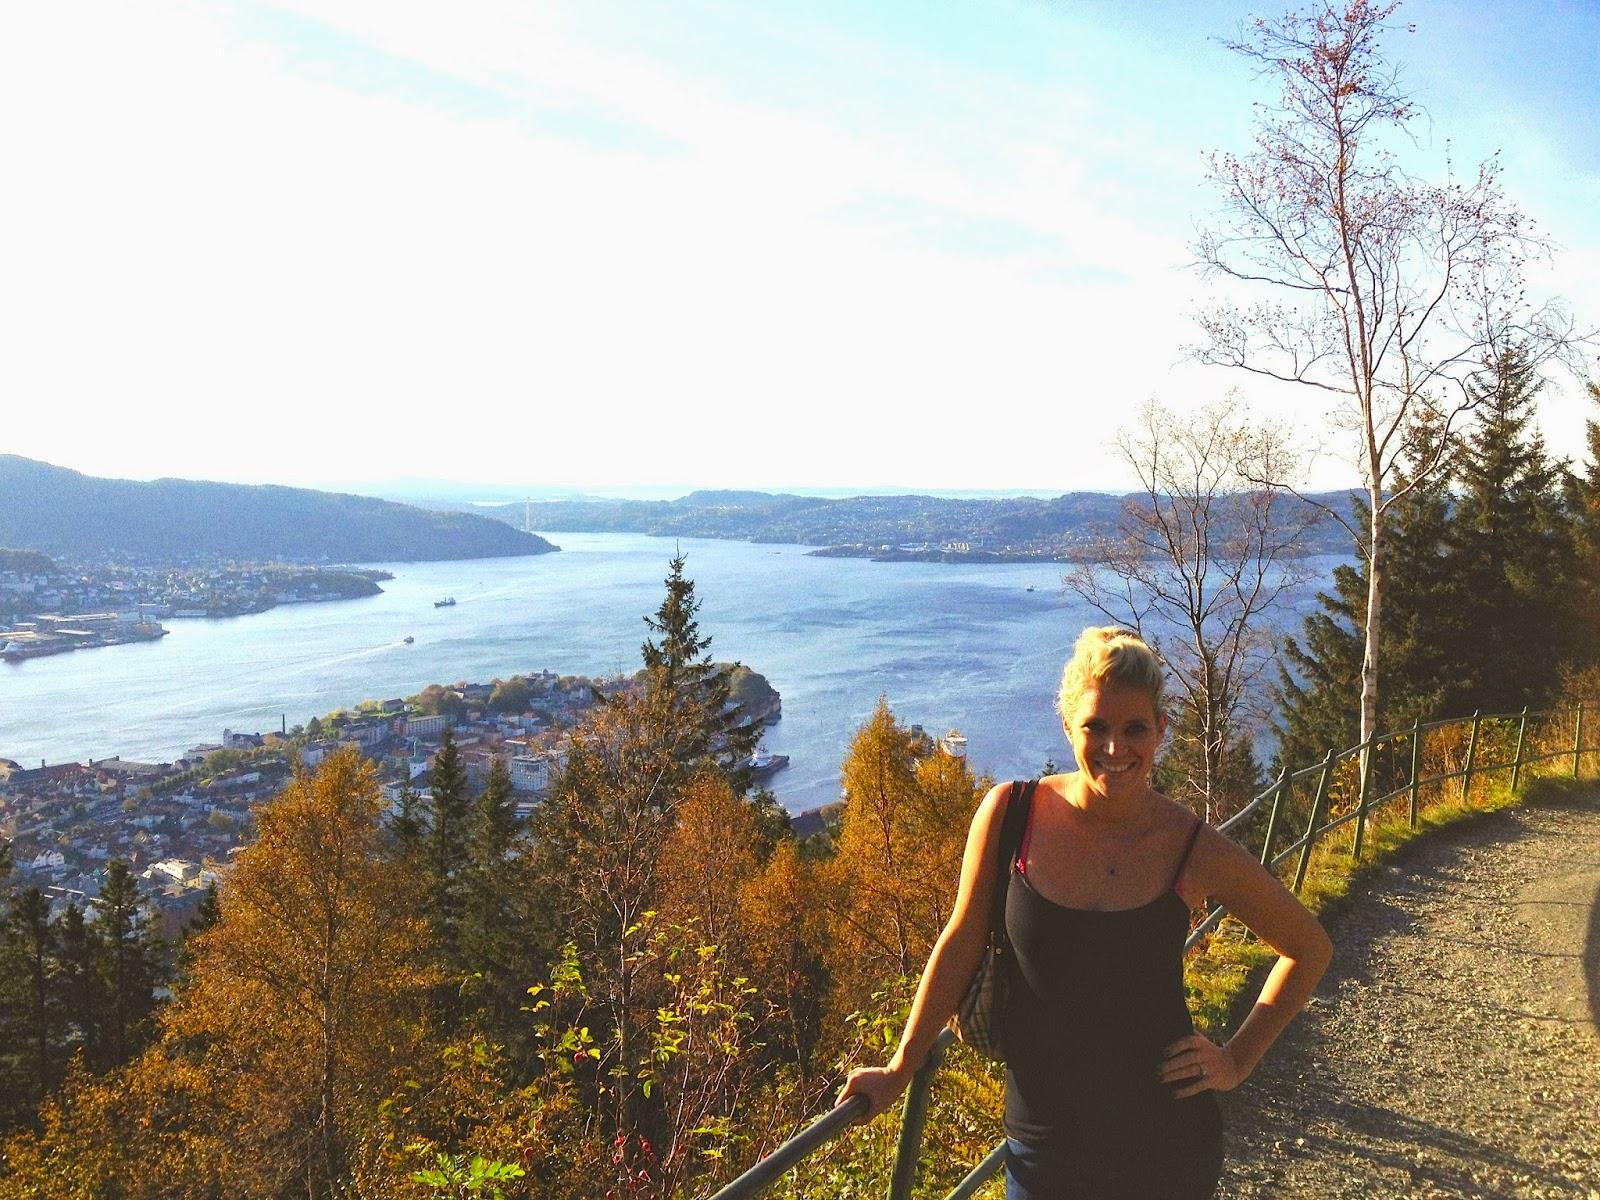 Mount Fløyen hiking